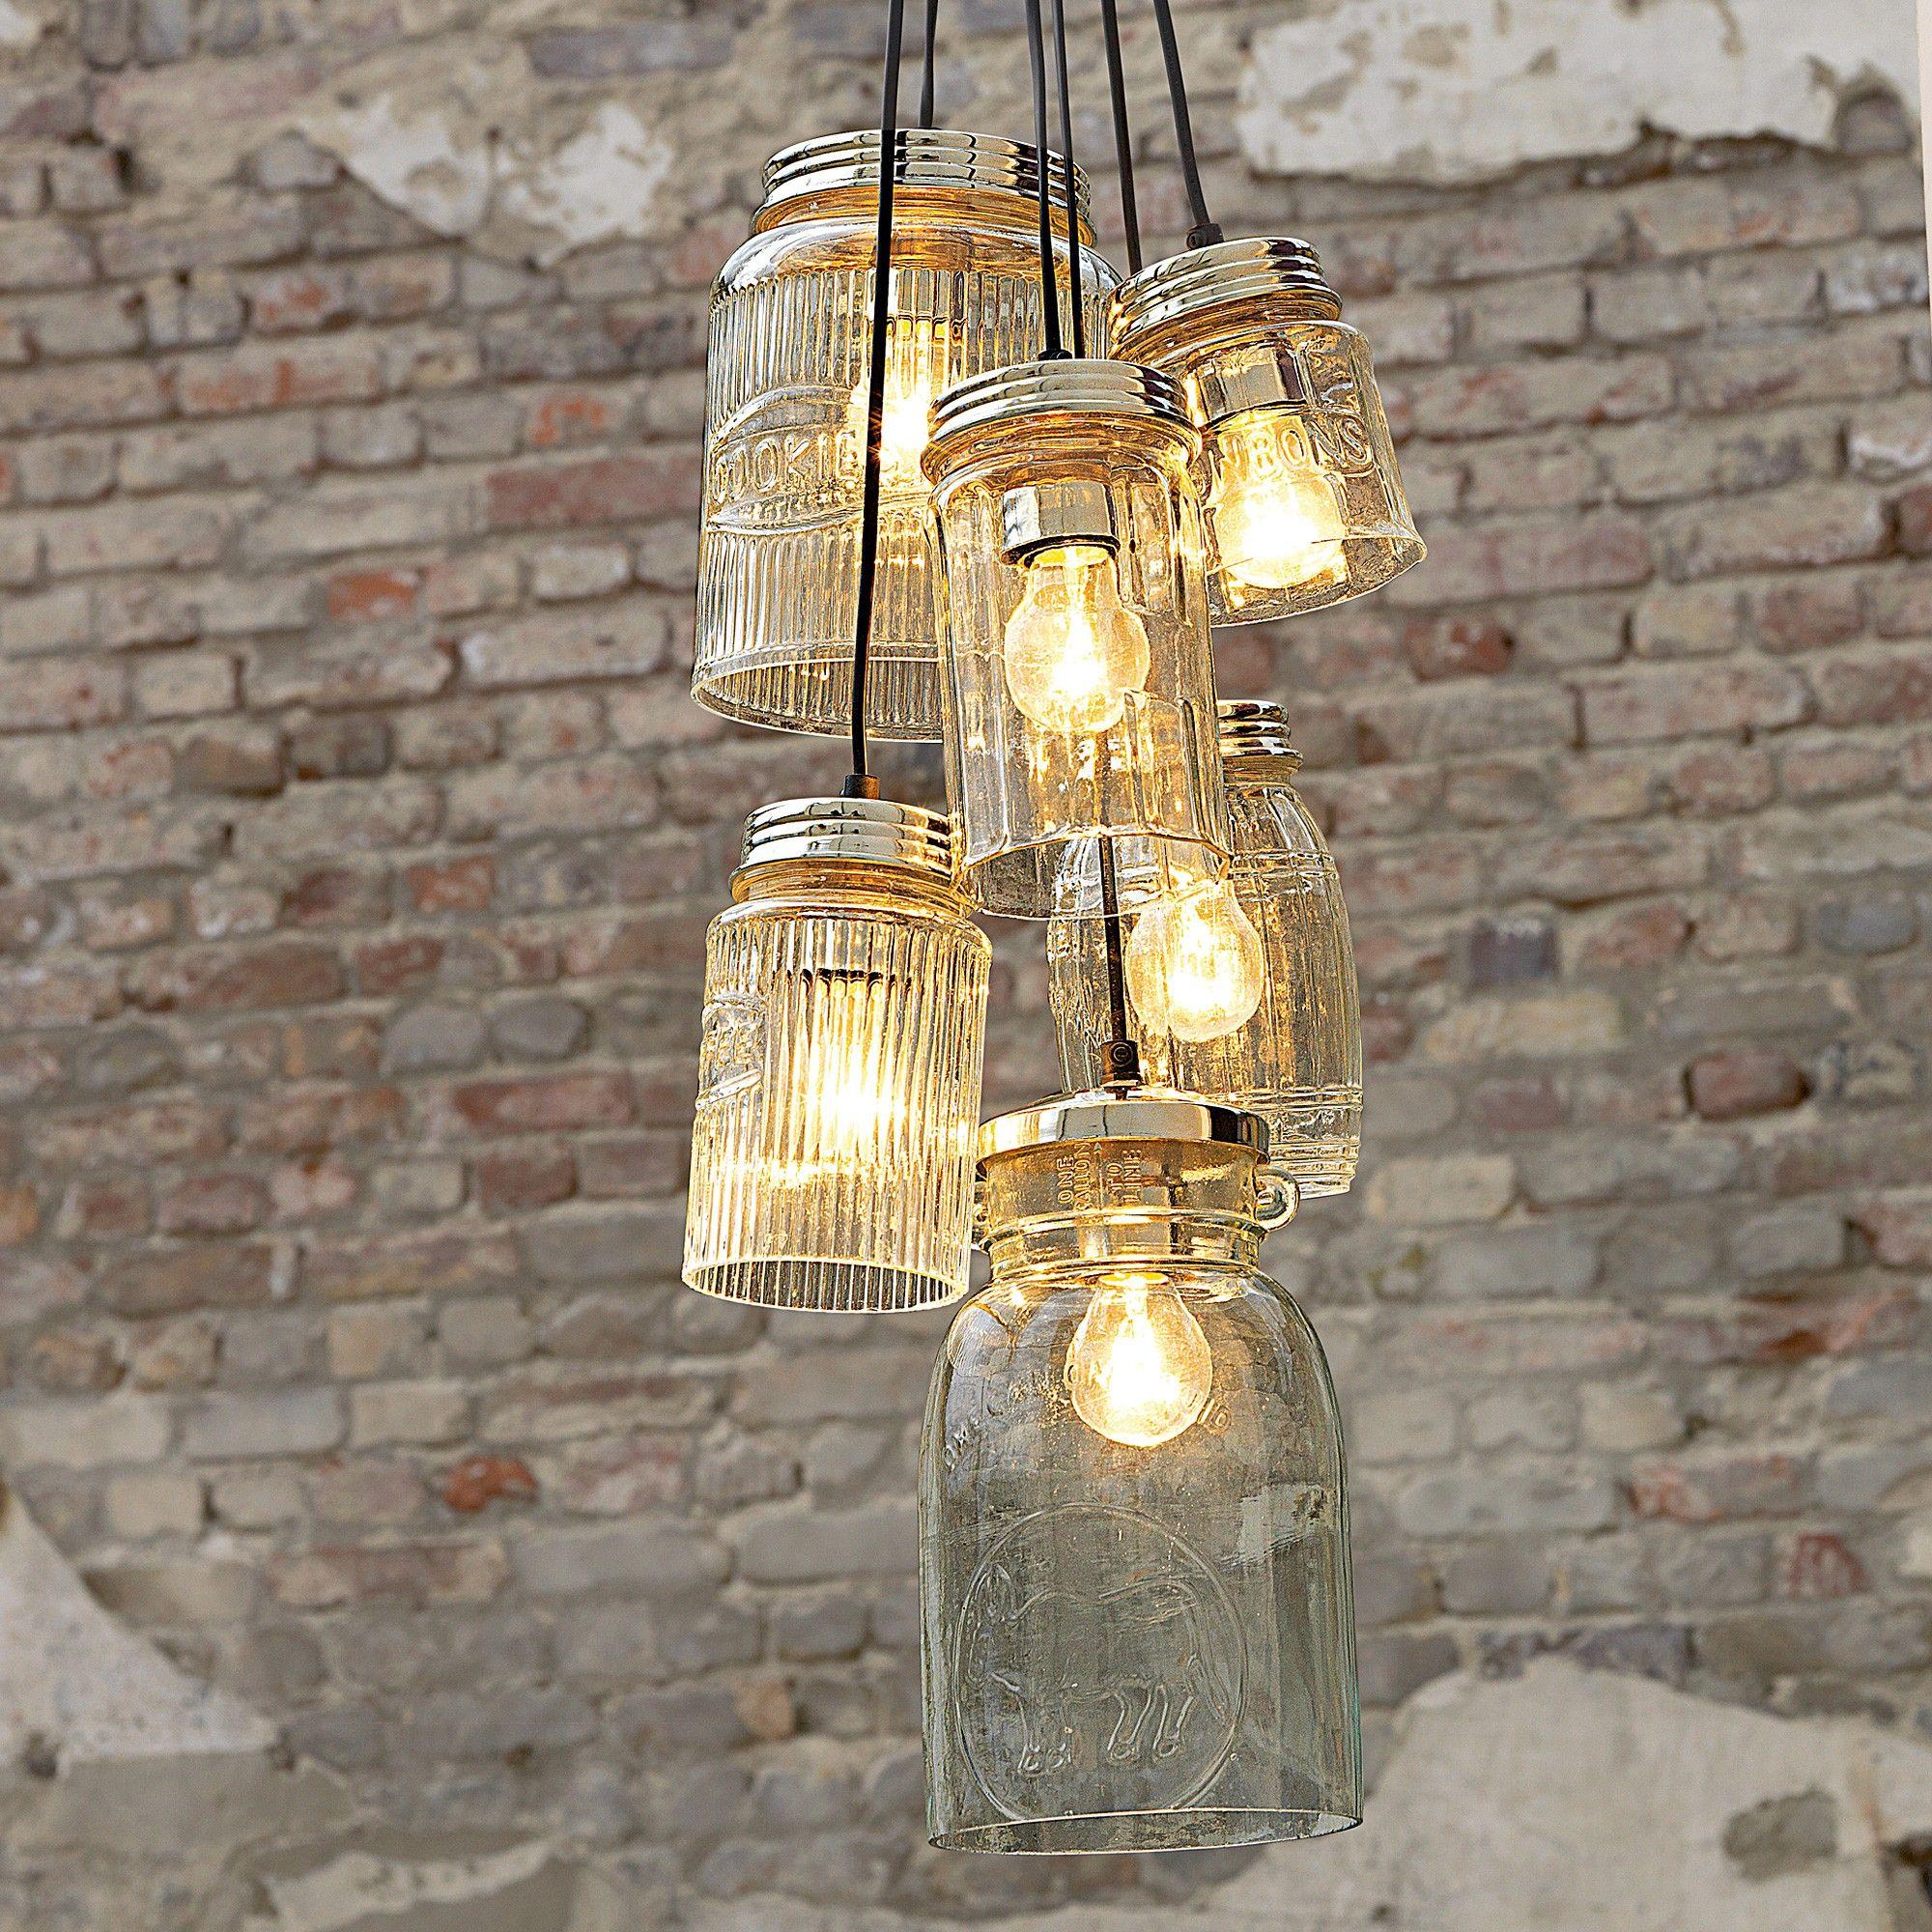 Vintage Lampe Deckenleuchte Design Rustikale Lampen